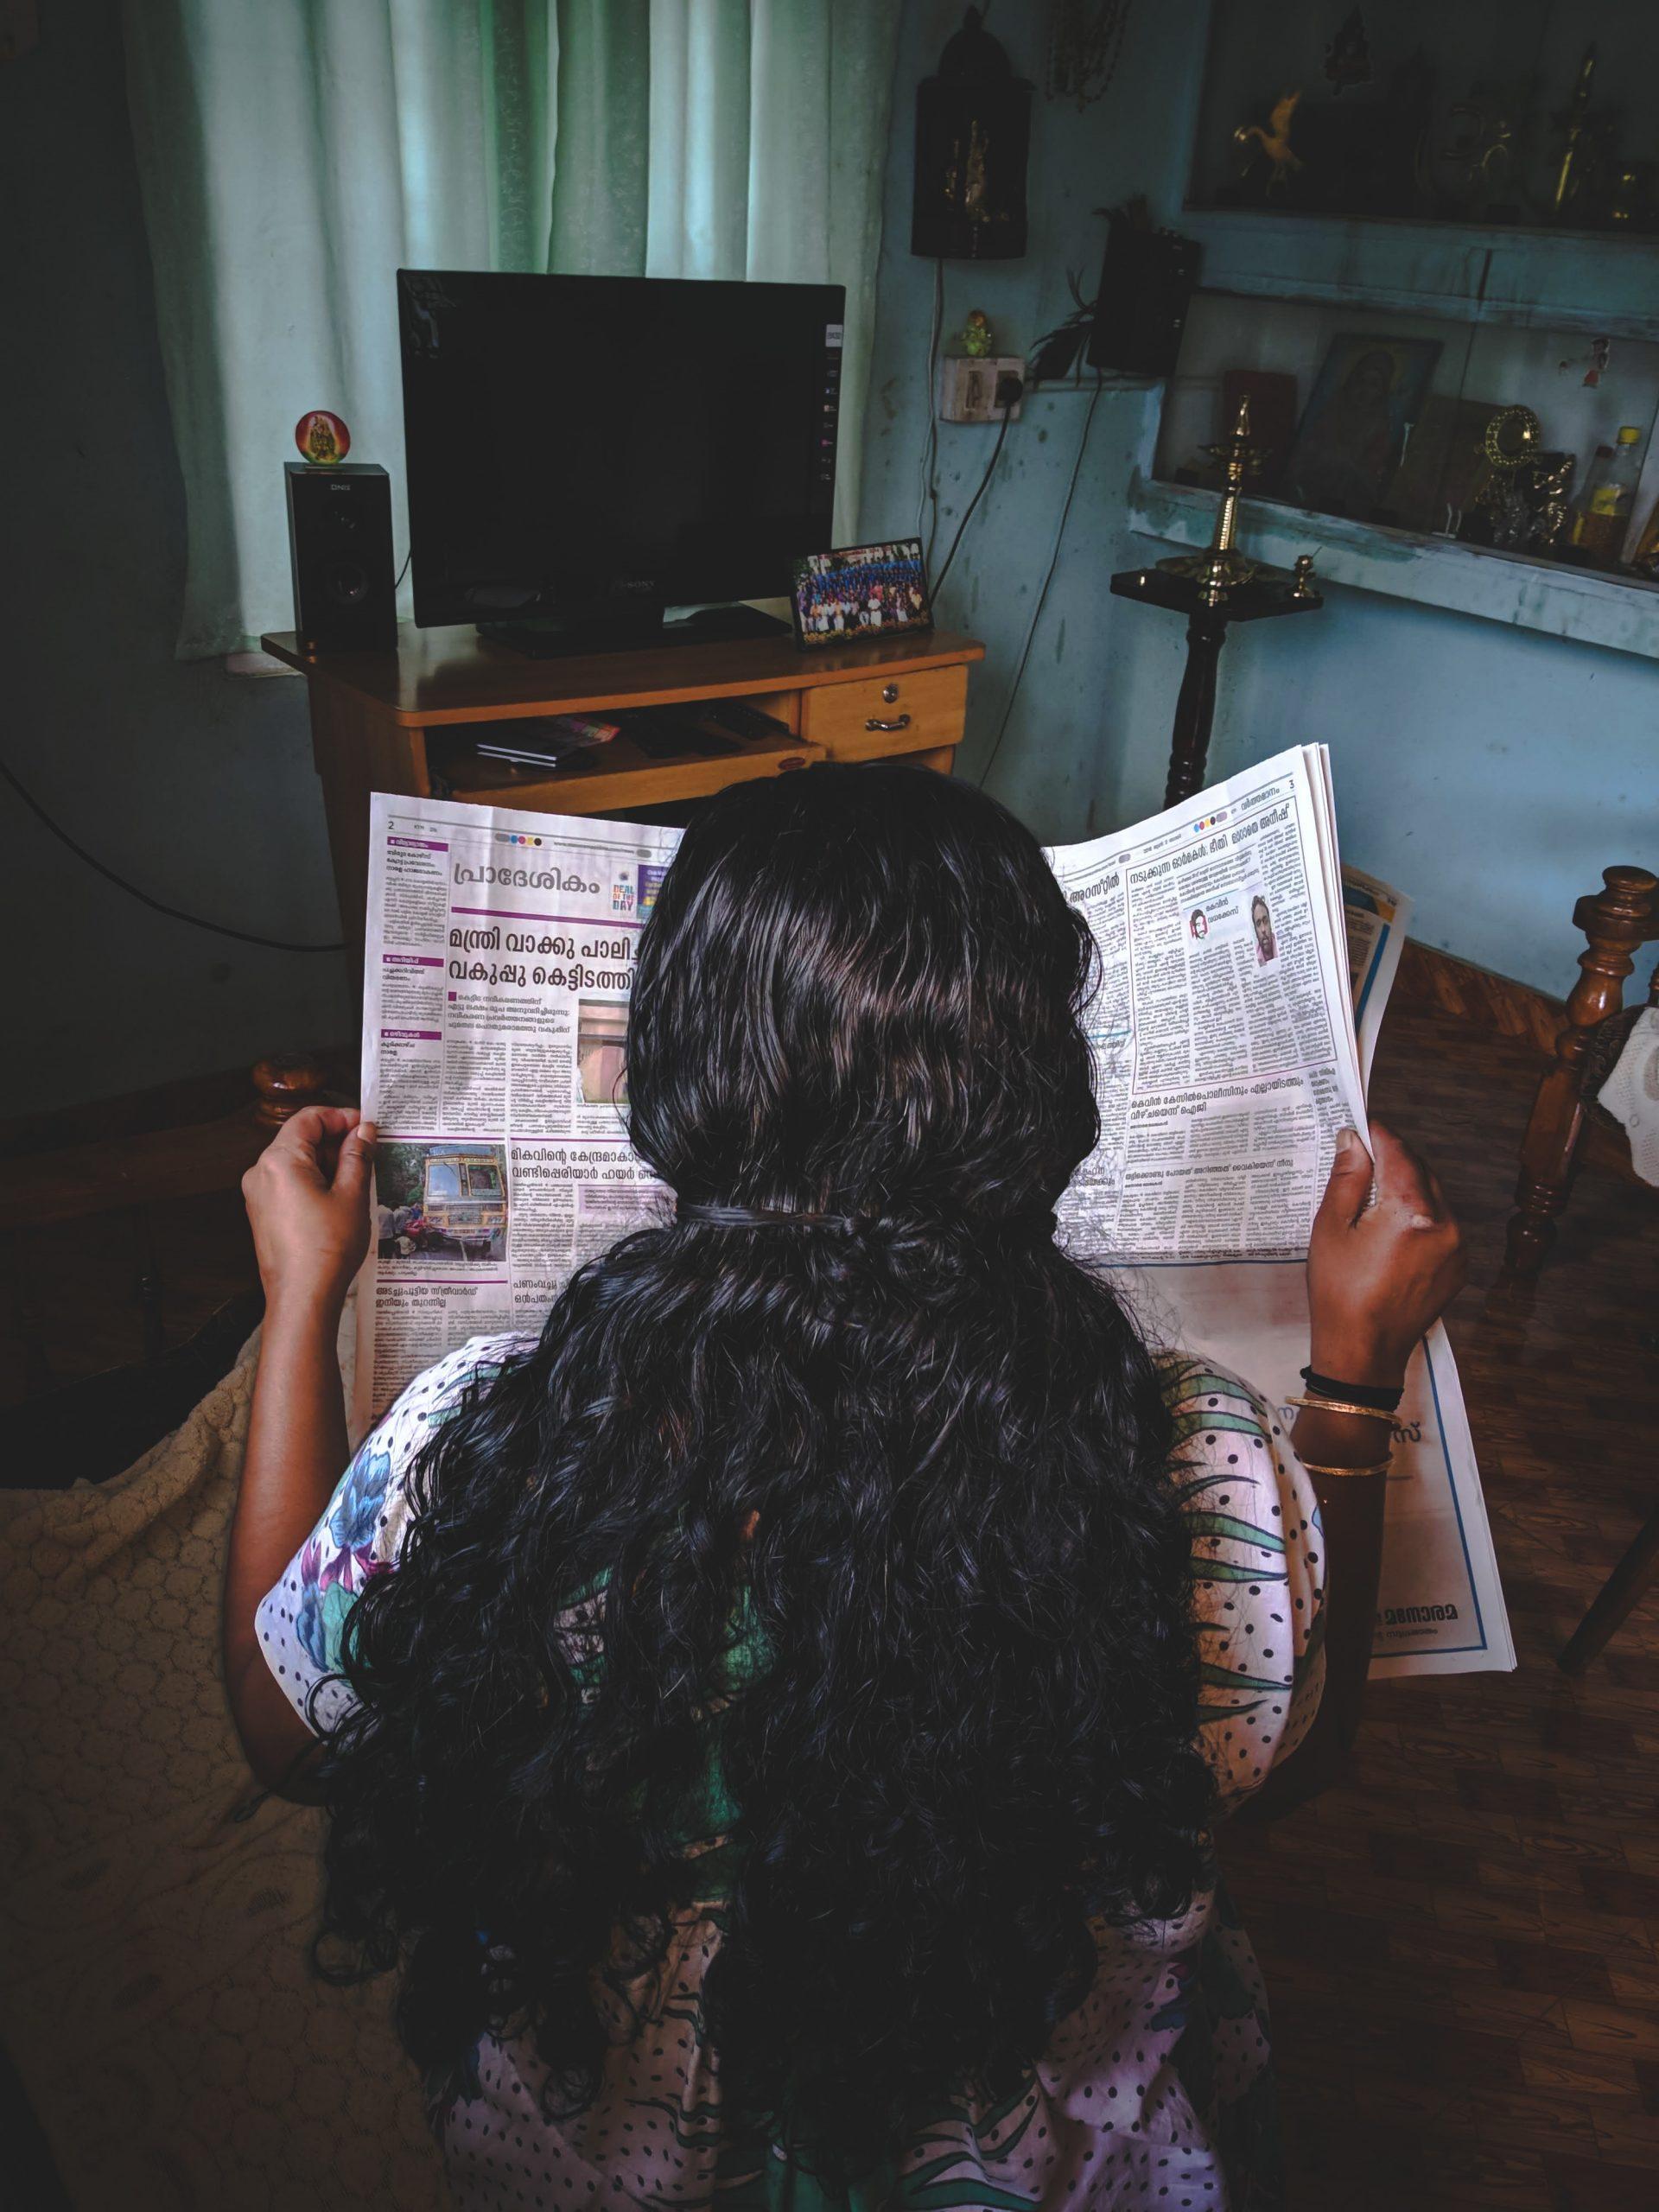 International Women's Day: Celebrating Inspiring Women Journalists and Lawyers